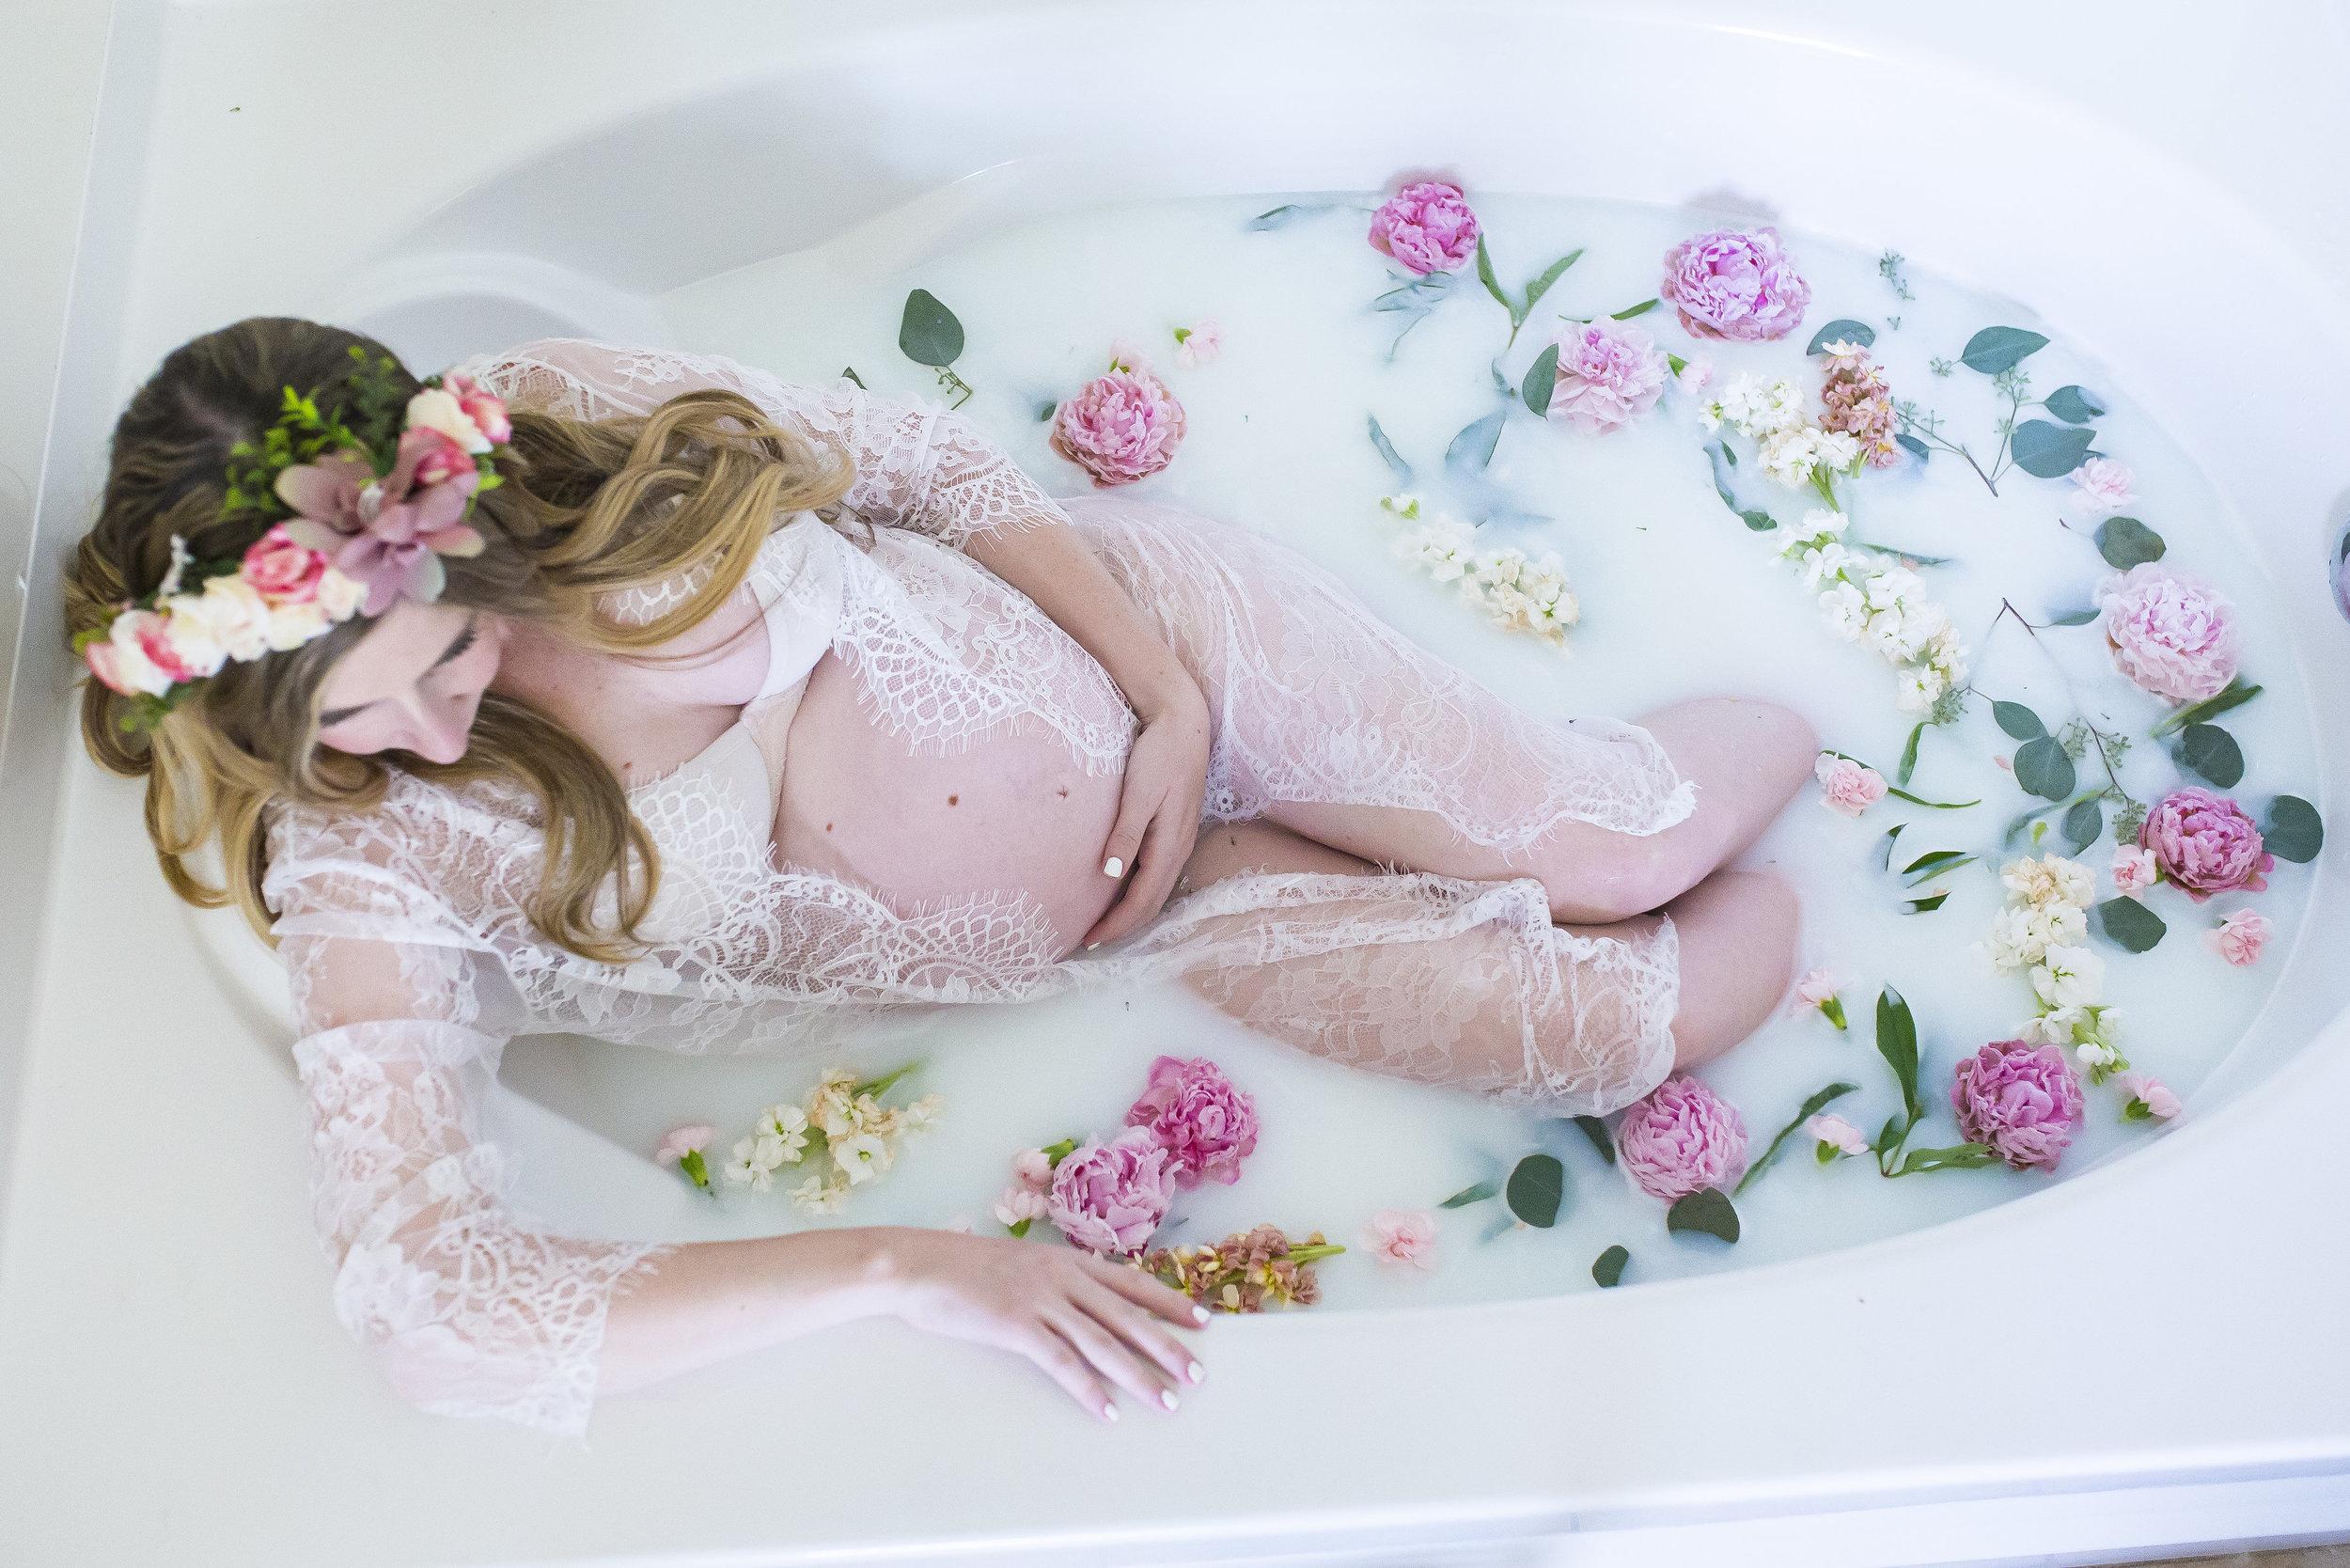 Milk Bath Maternity Photography Pictures | Milk Bath Tips | Milk Bath Pregnancy